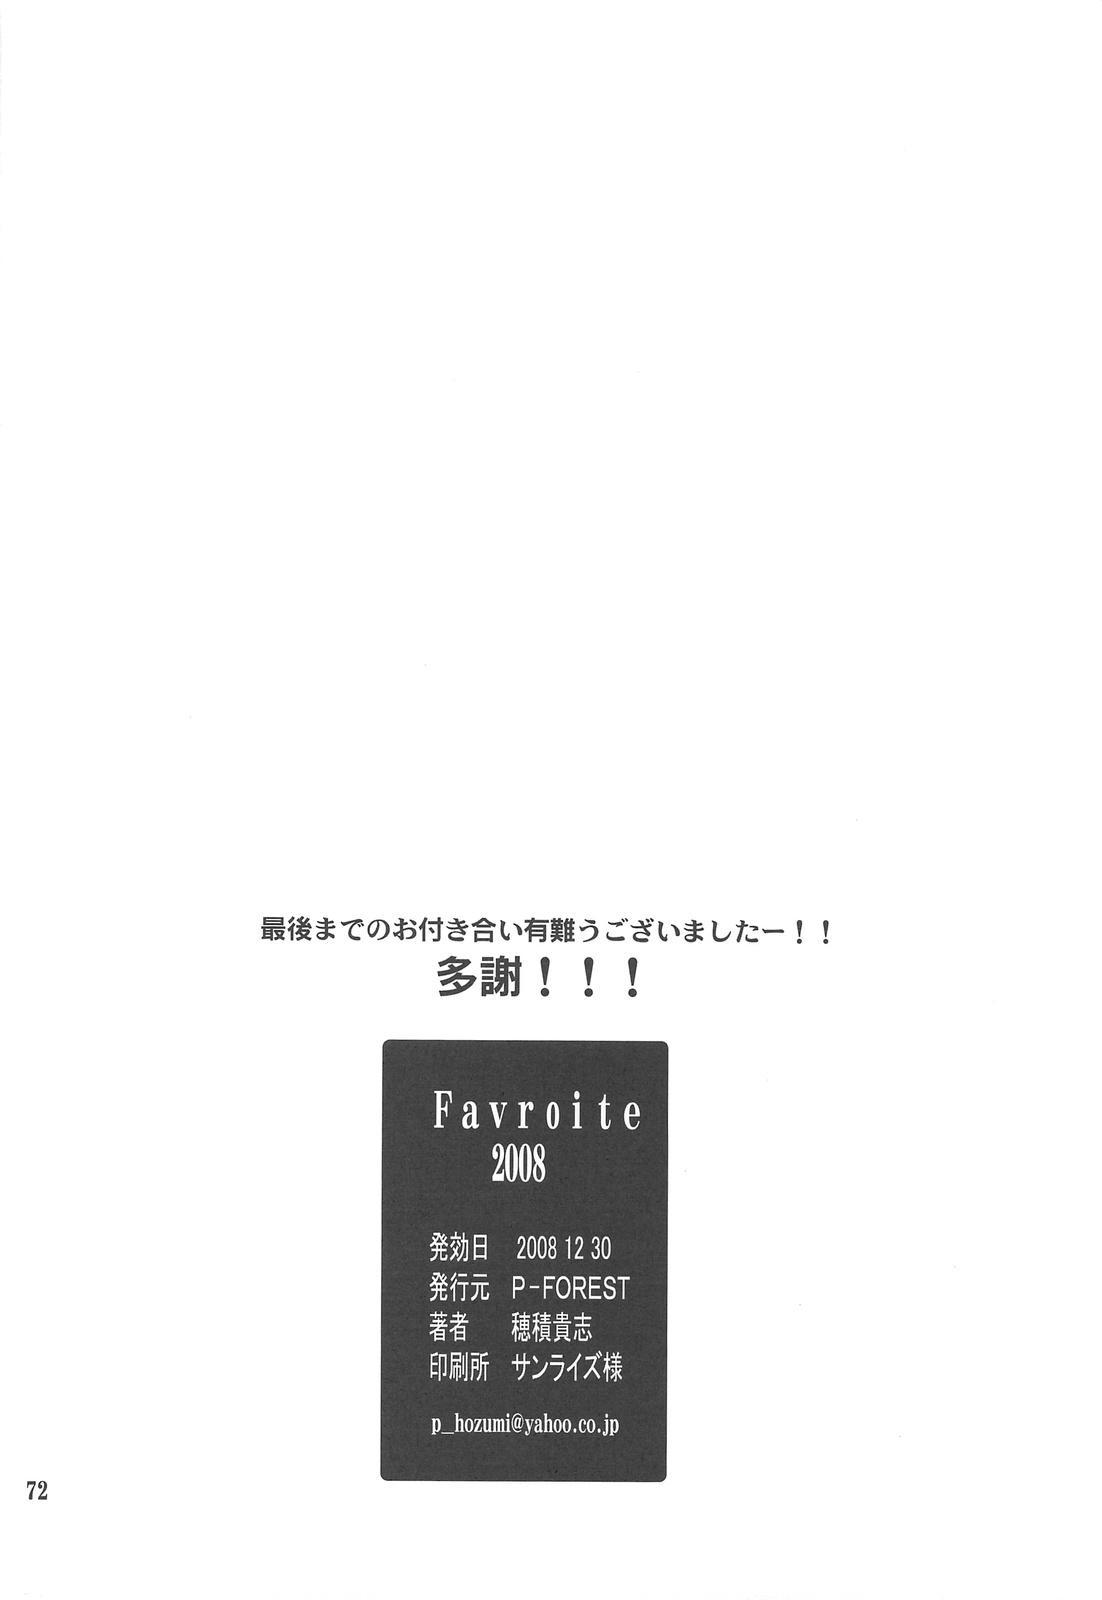 FAVORITE 2008 70